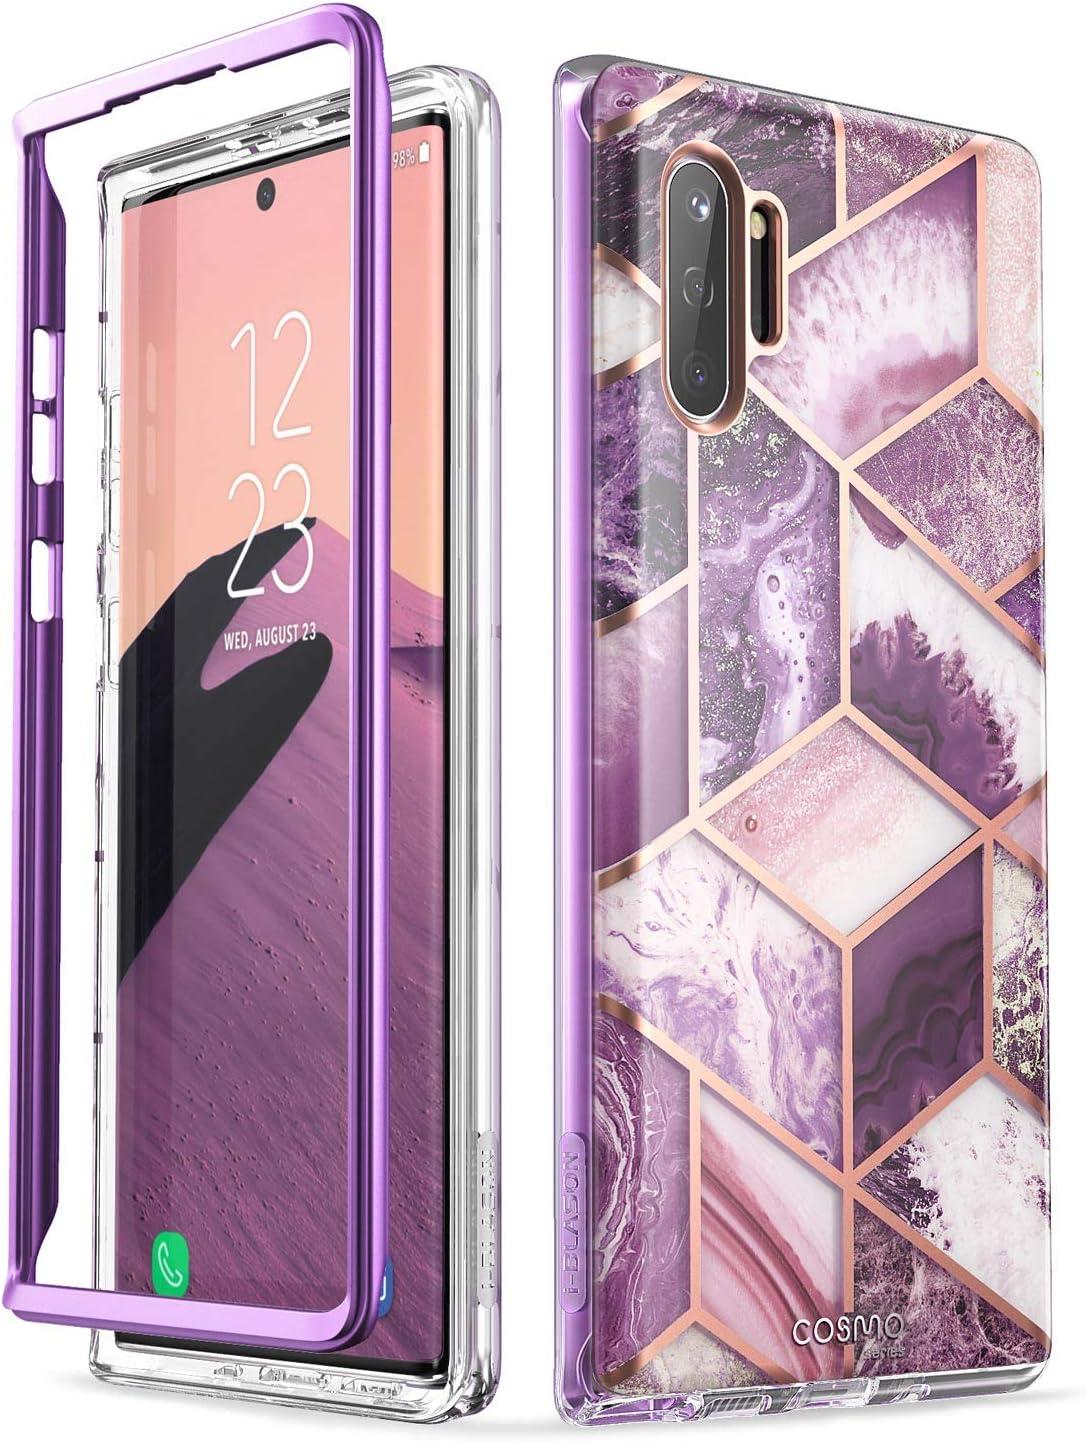 i-Blason Cosmo Series Case for Galaxy Note 10 Plus/Note 10 Plus 5G 2019 Release, Purple